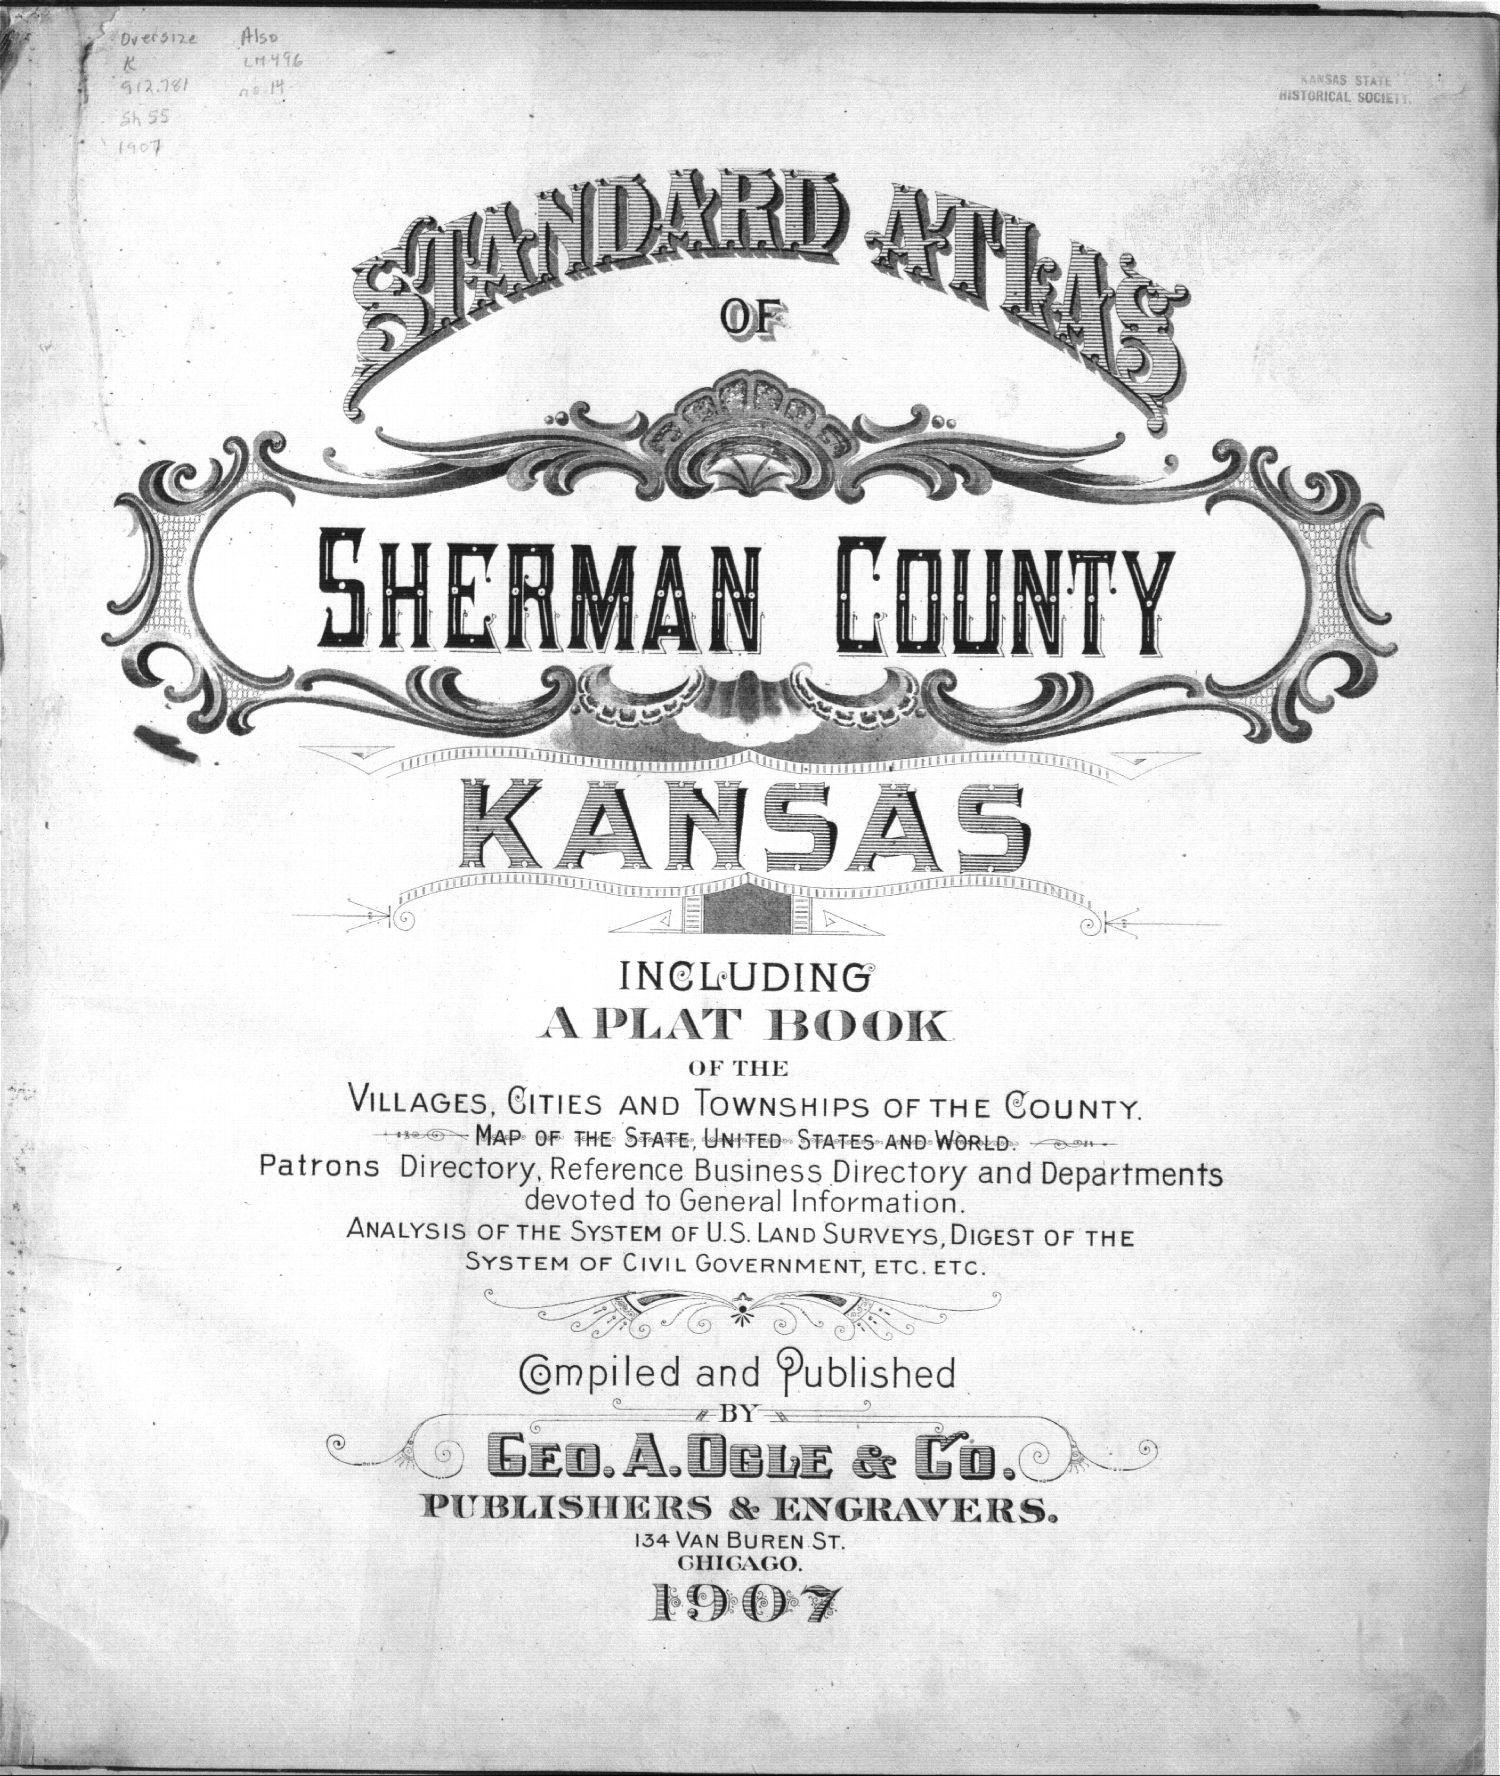 Standard atlas of Sherman County, Kansas - Title Page